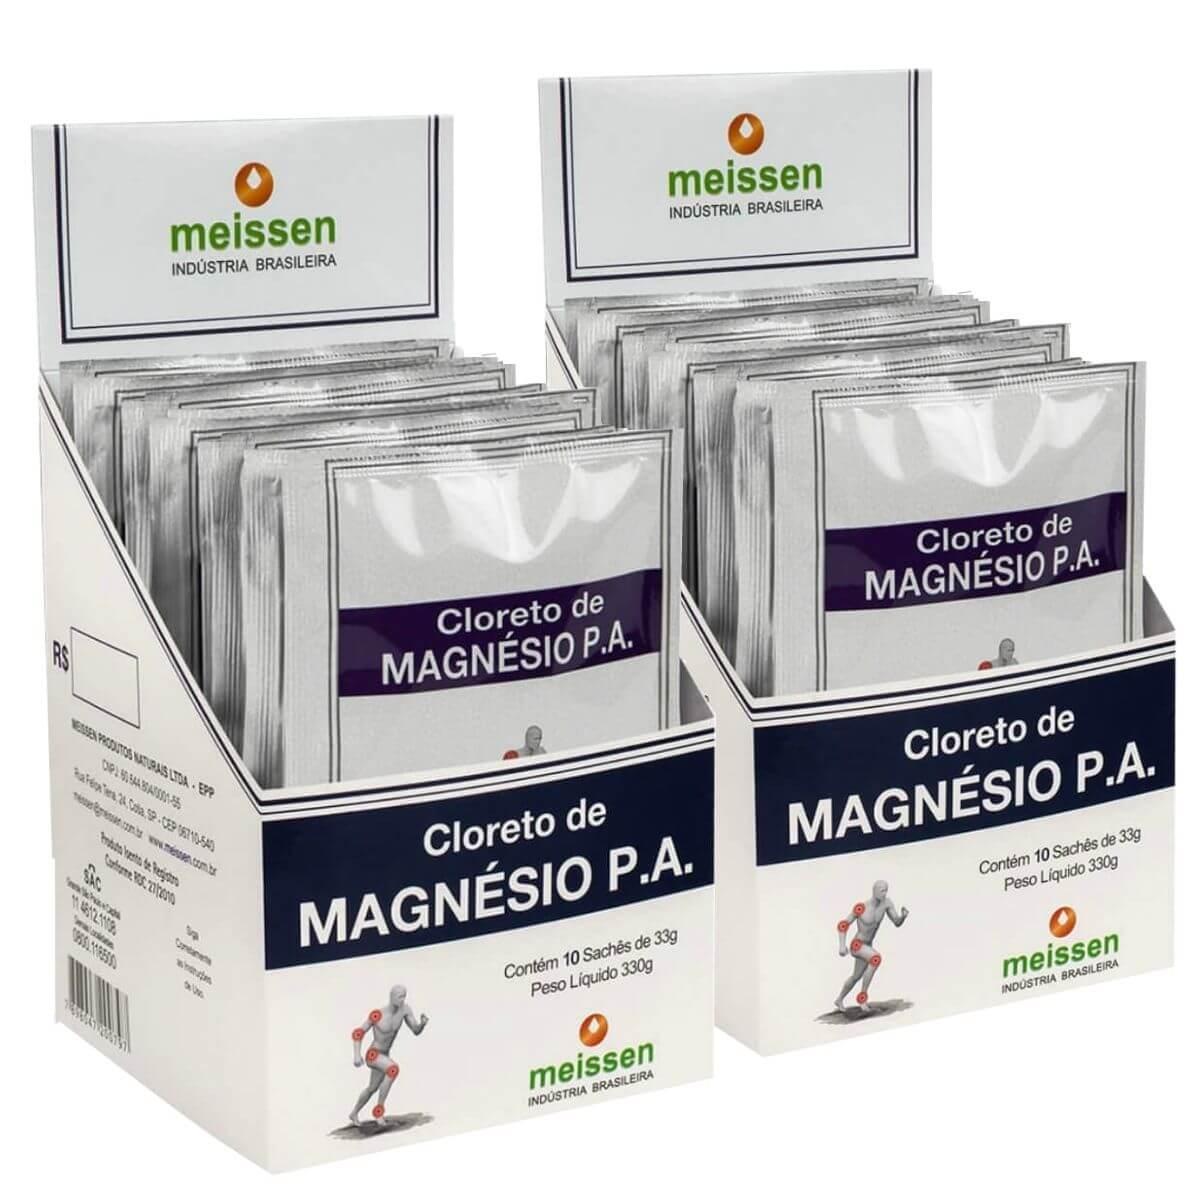 2x Cloreto De Magnésio Pa Display 10x 33g - Total 20 Saches